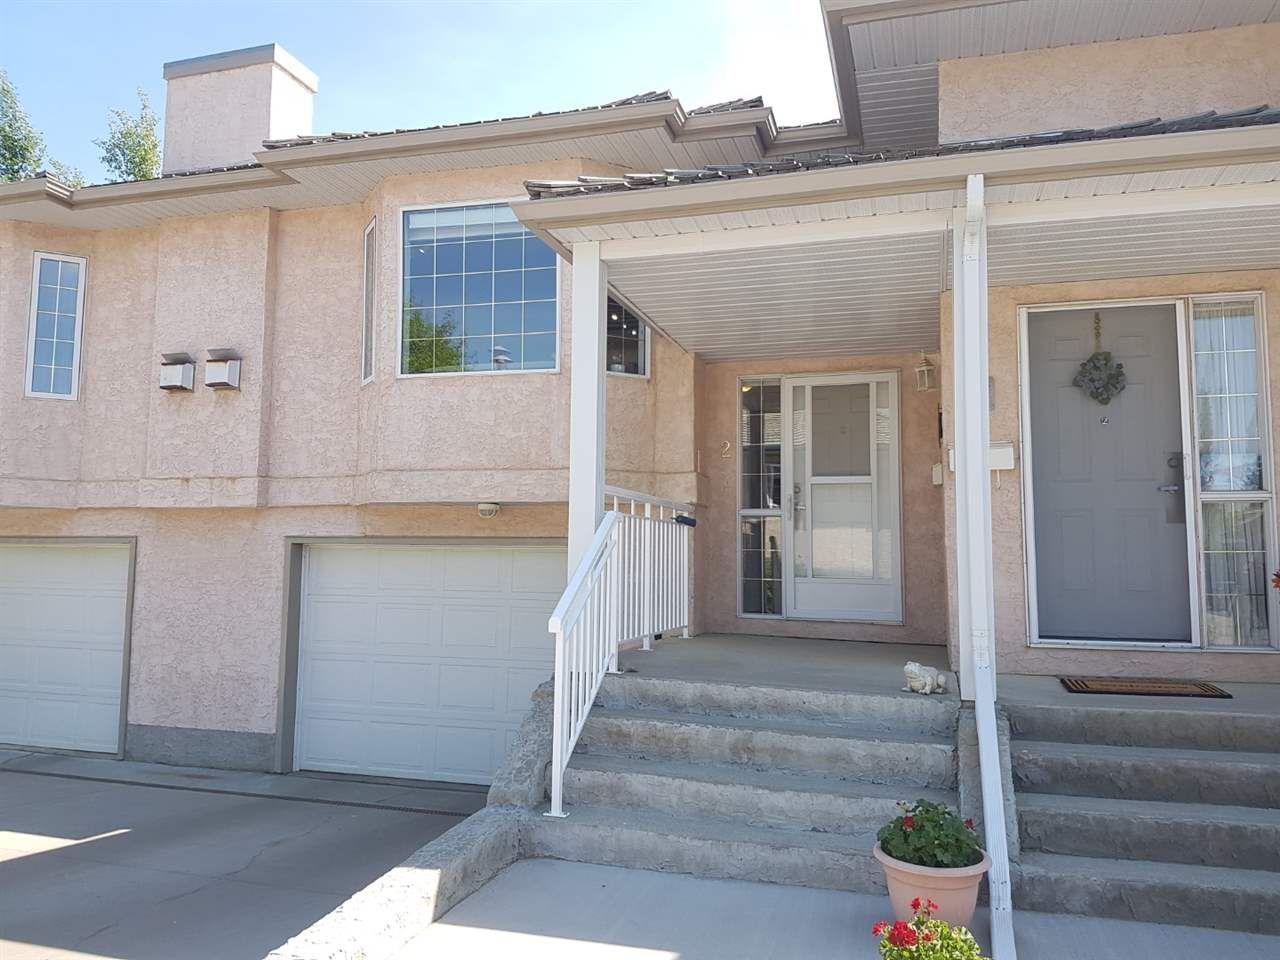 Main Photo: 2 30 Giroux Road: St. Albert House Triplex for sale : MLS®# E4124253